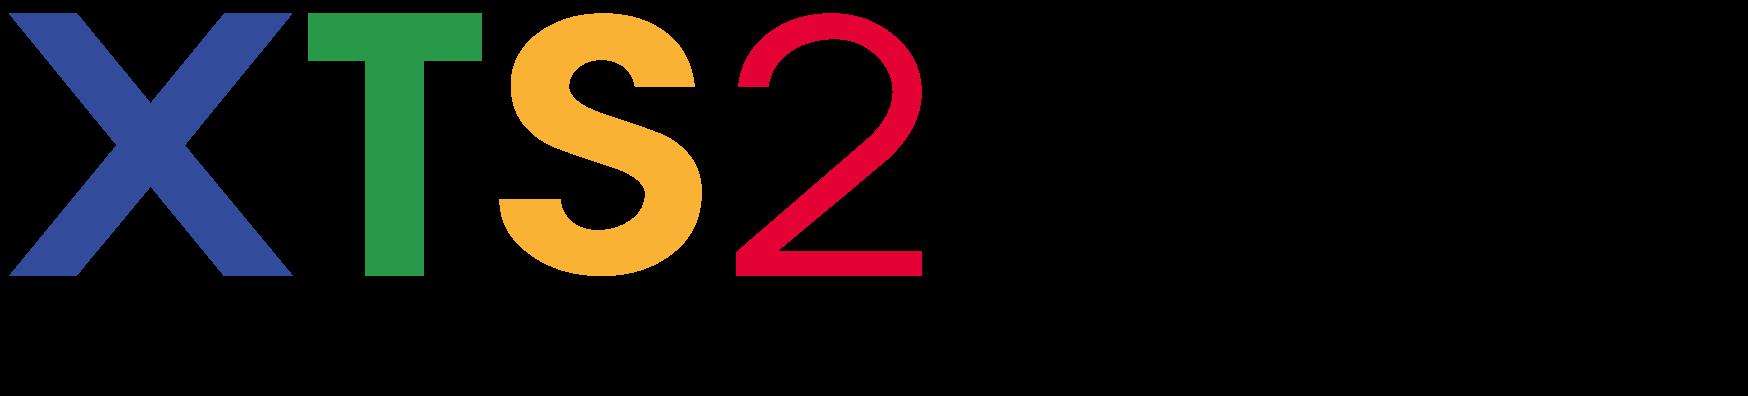 XPERT TRANSLATION SOLUTIONS24